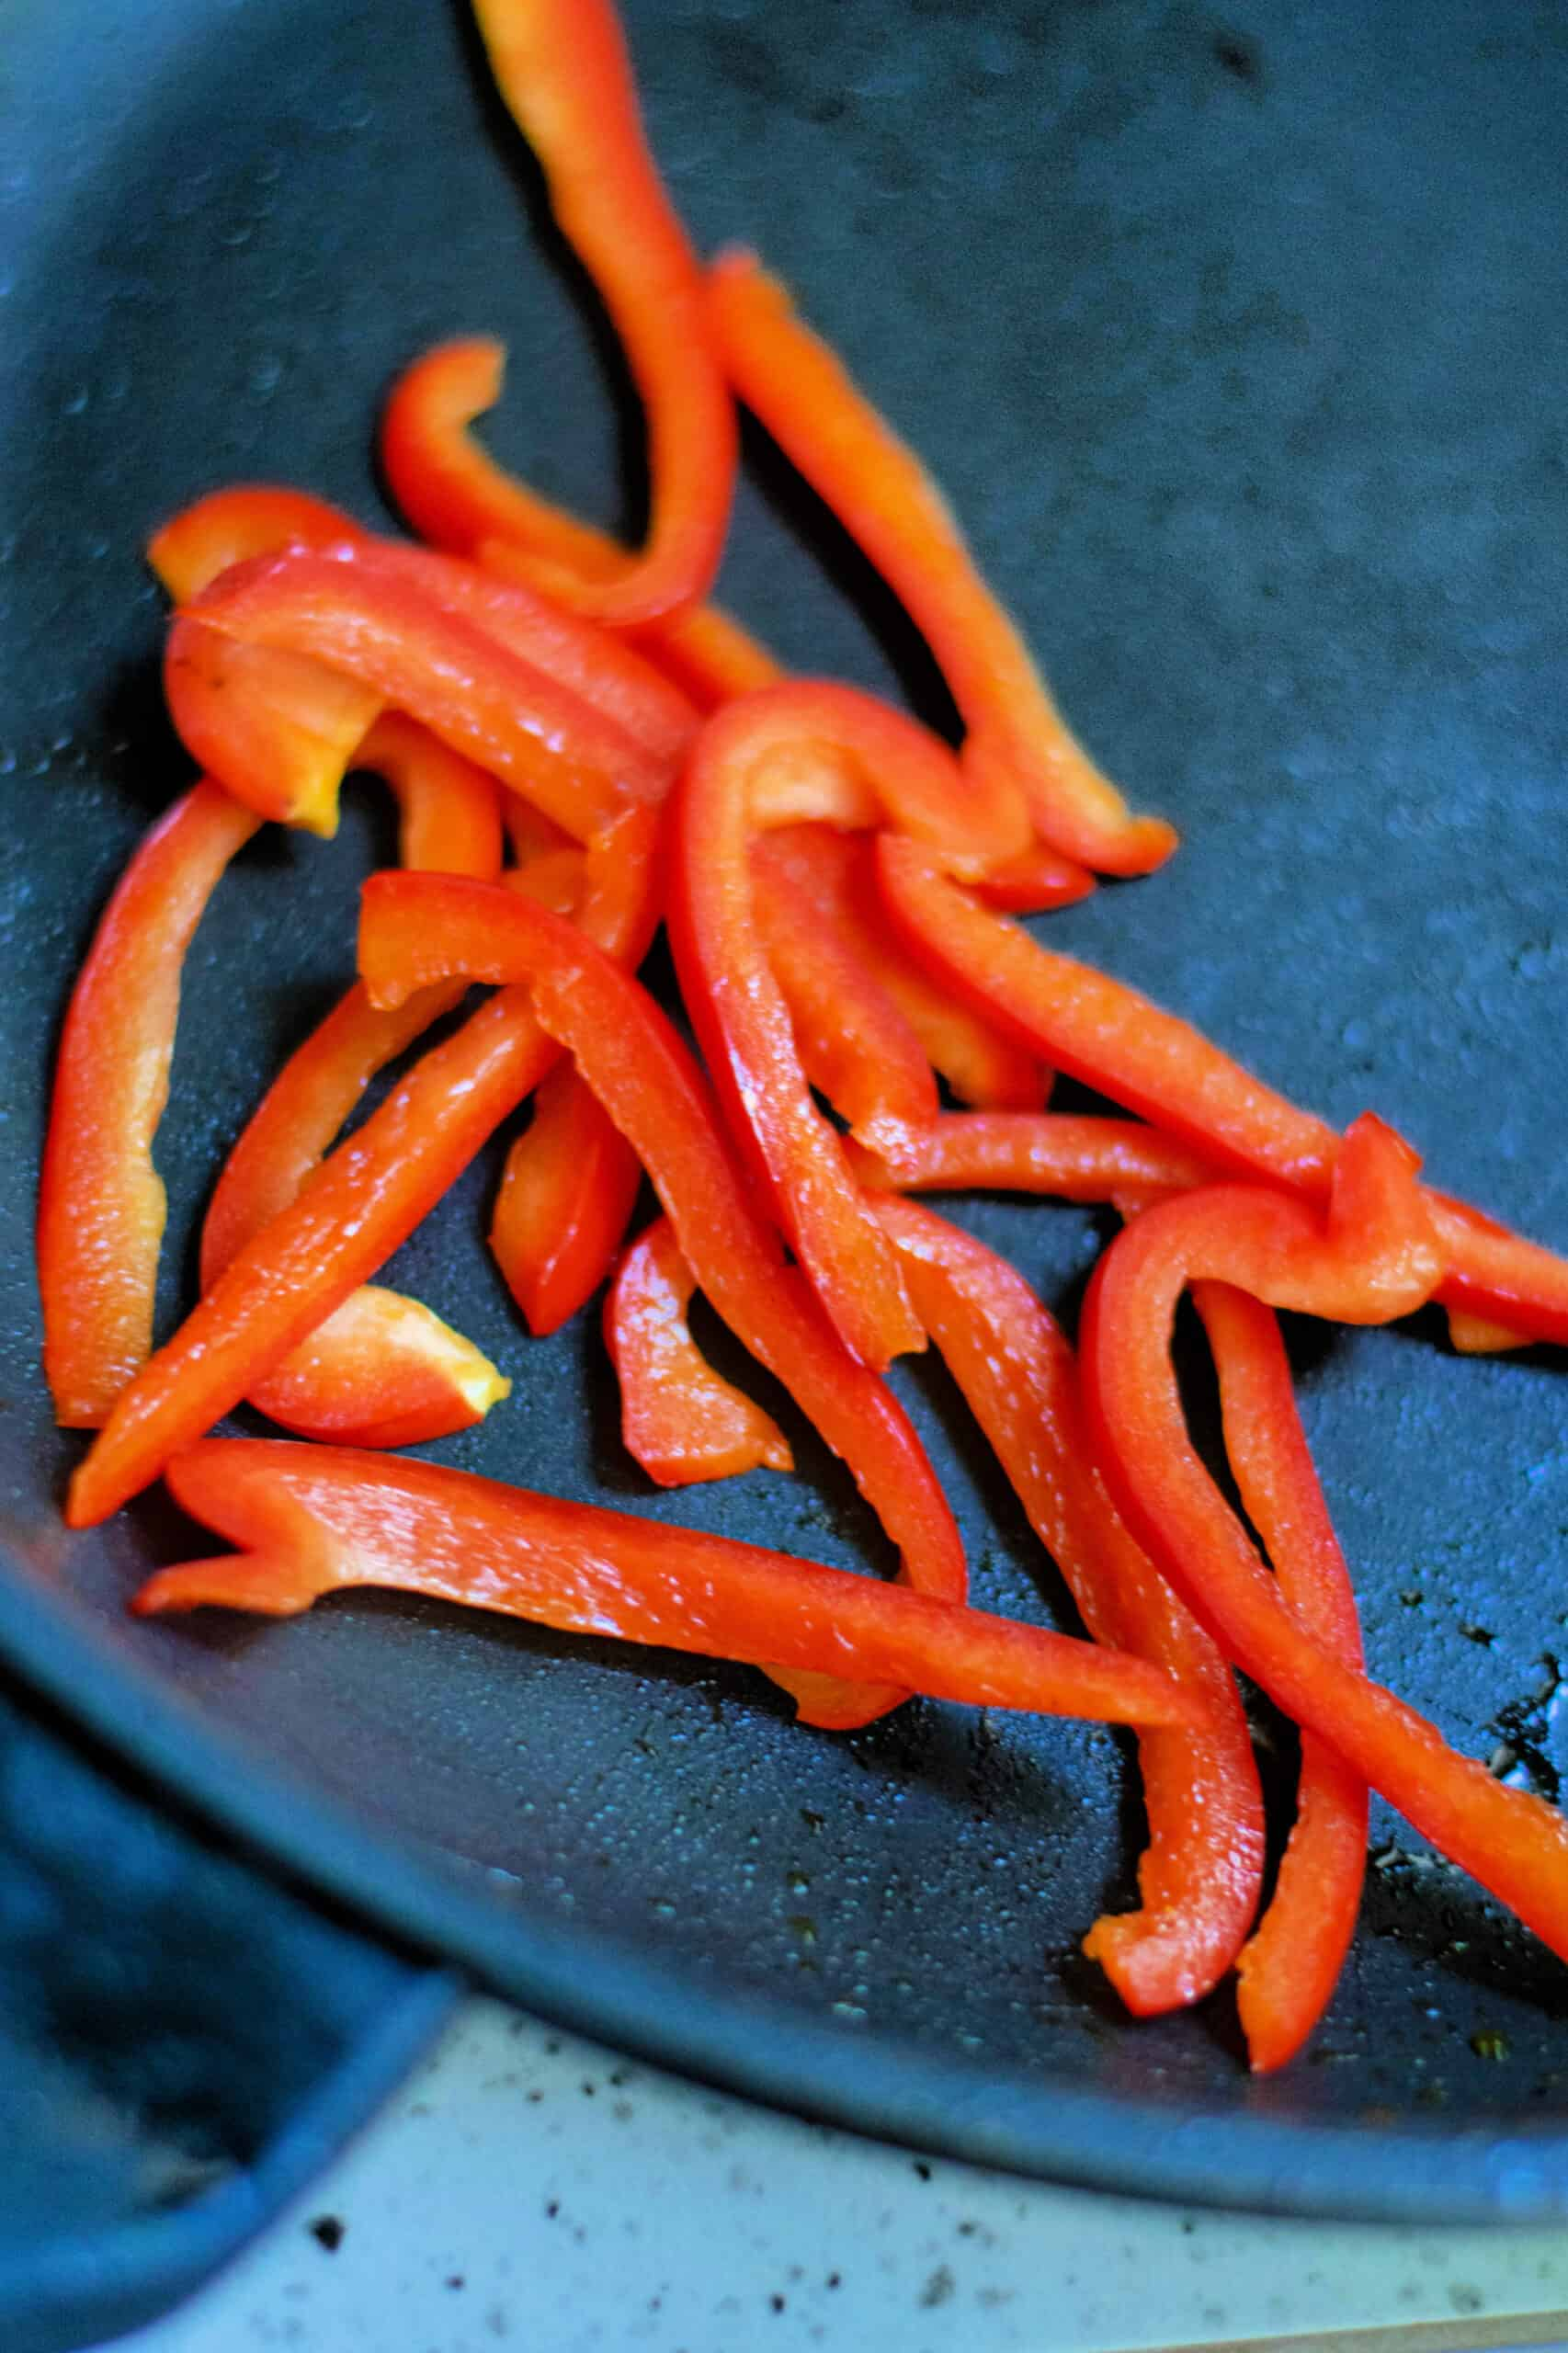 red bell pepper strips